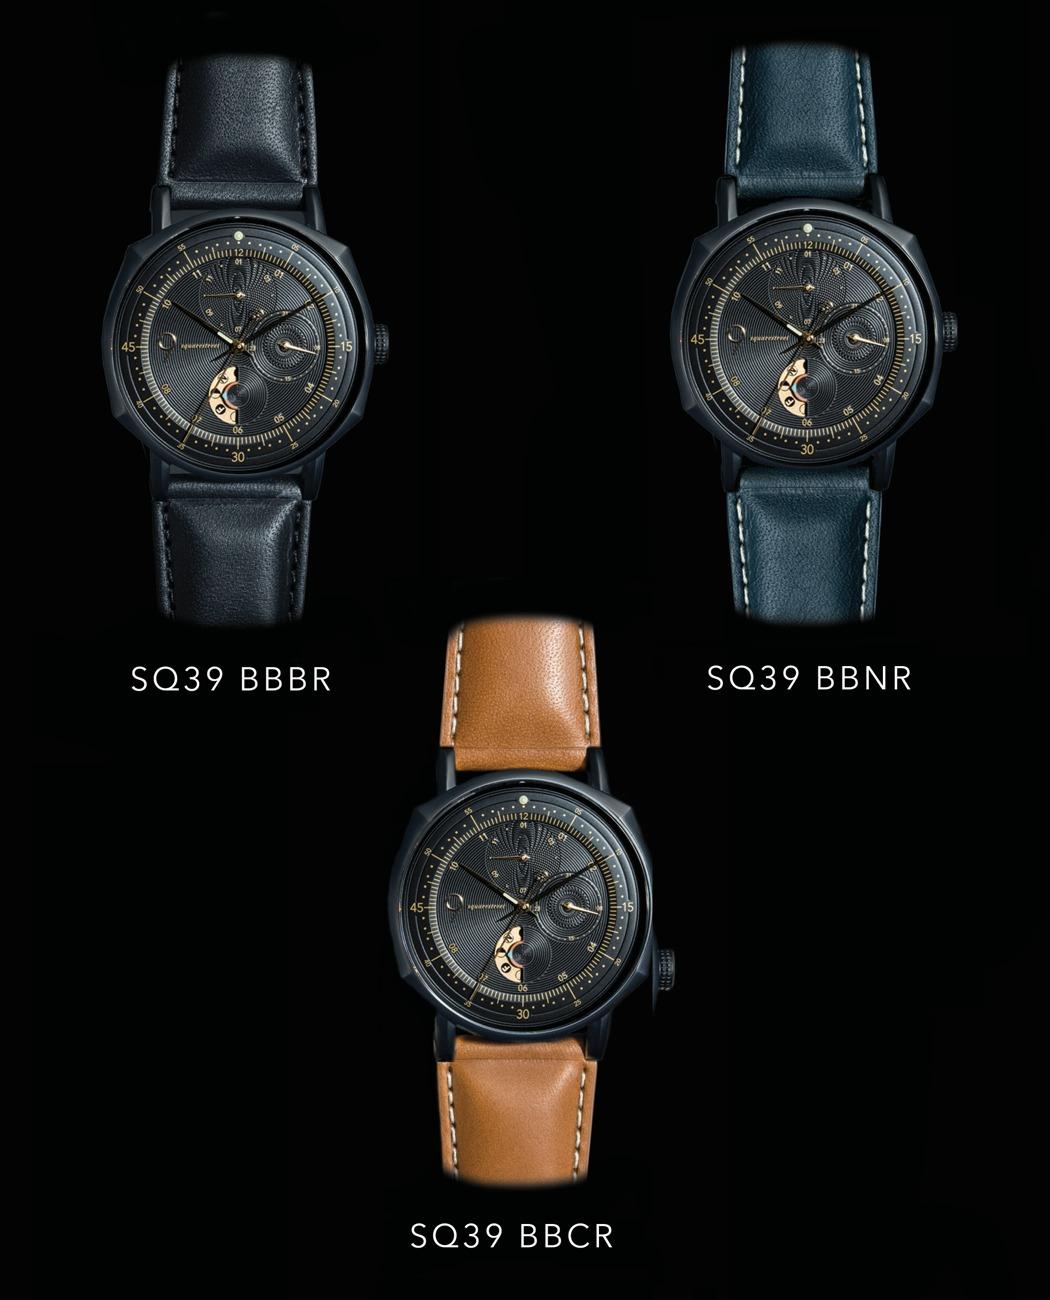 novem_moon_phase_chronograph_watch_18